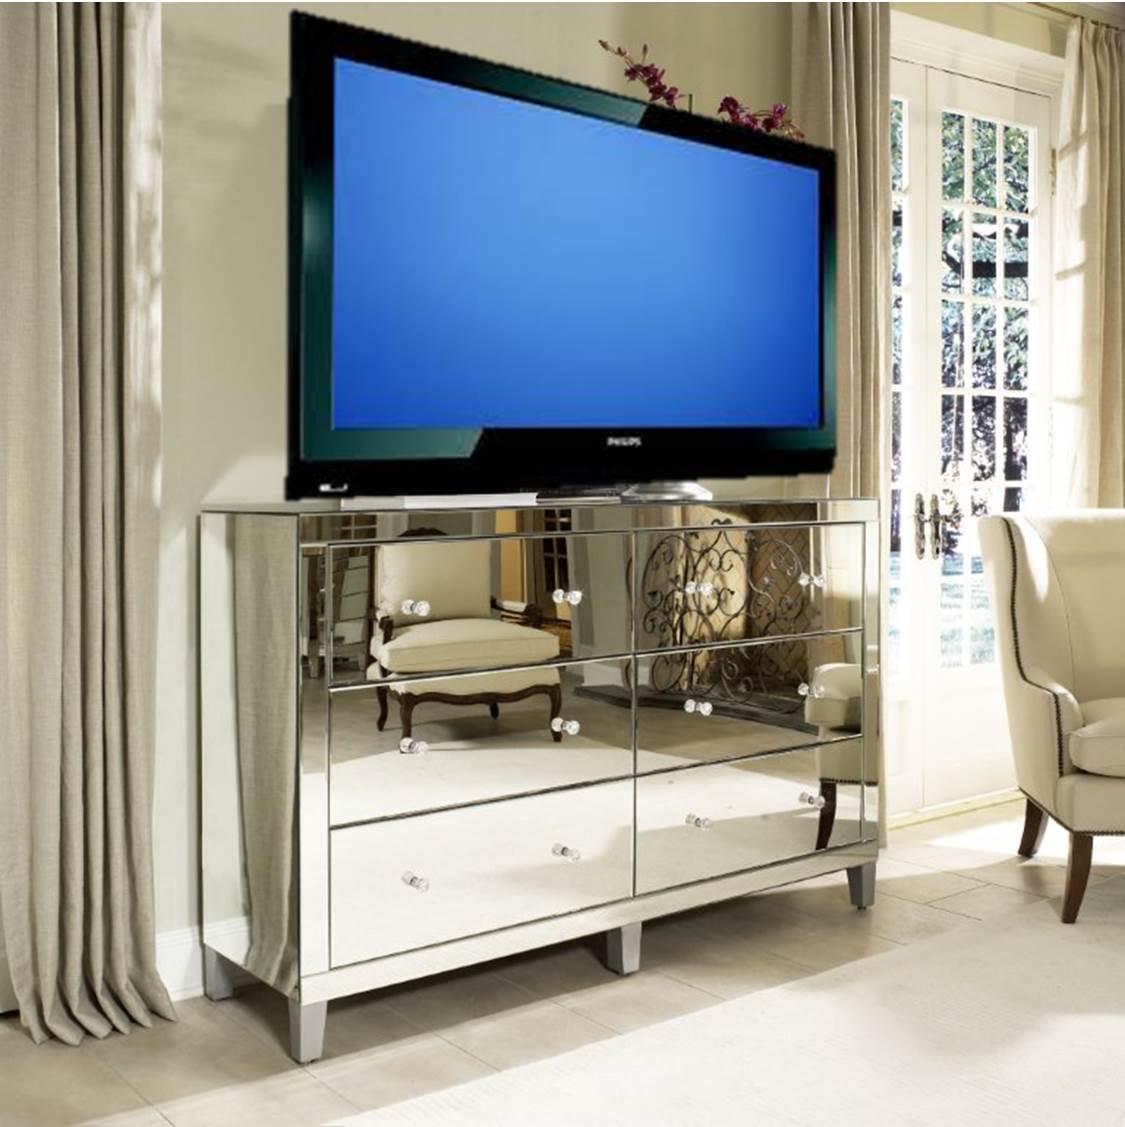 Manhattan Glamour Style: Using A Mirrored Dresser As A